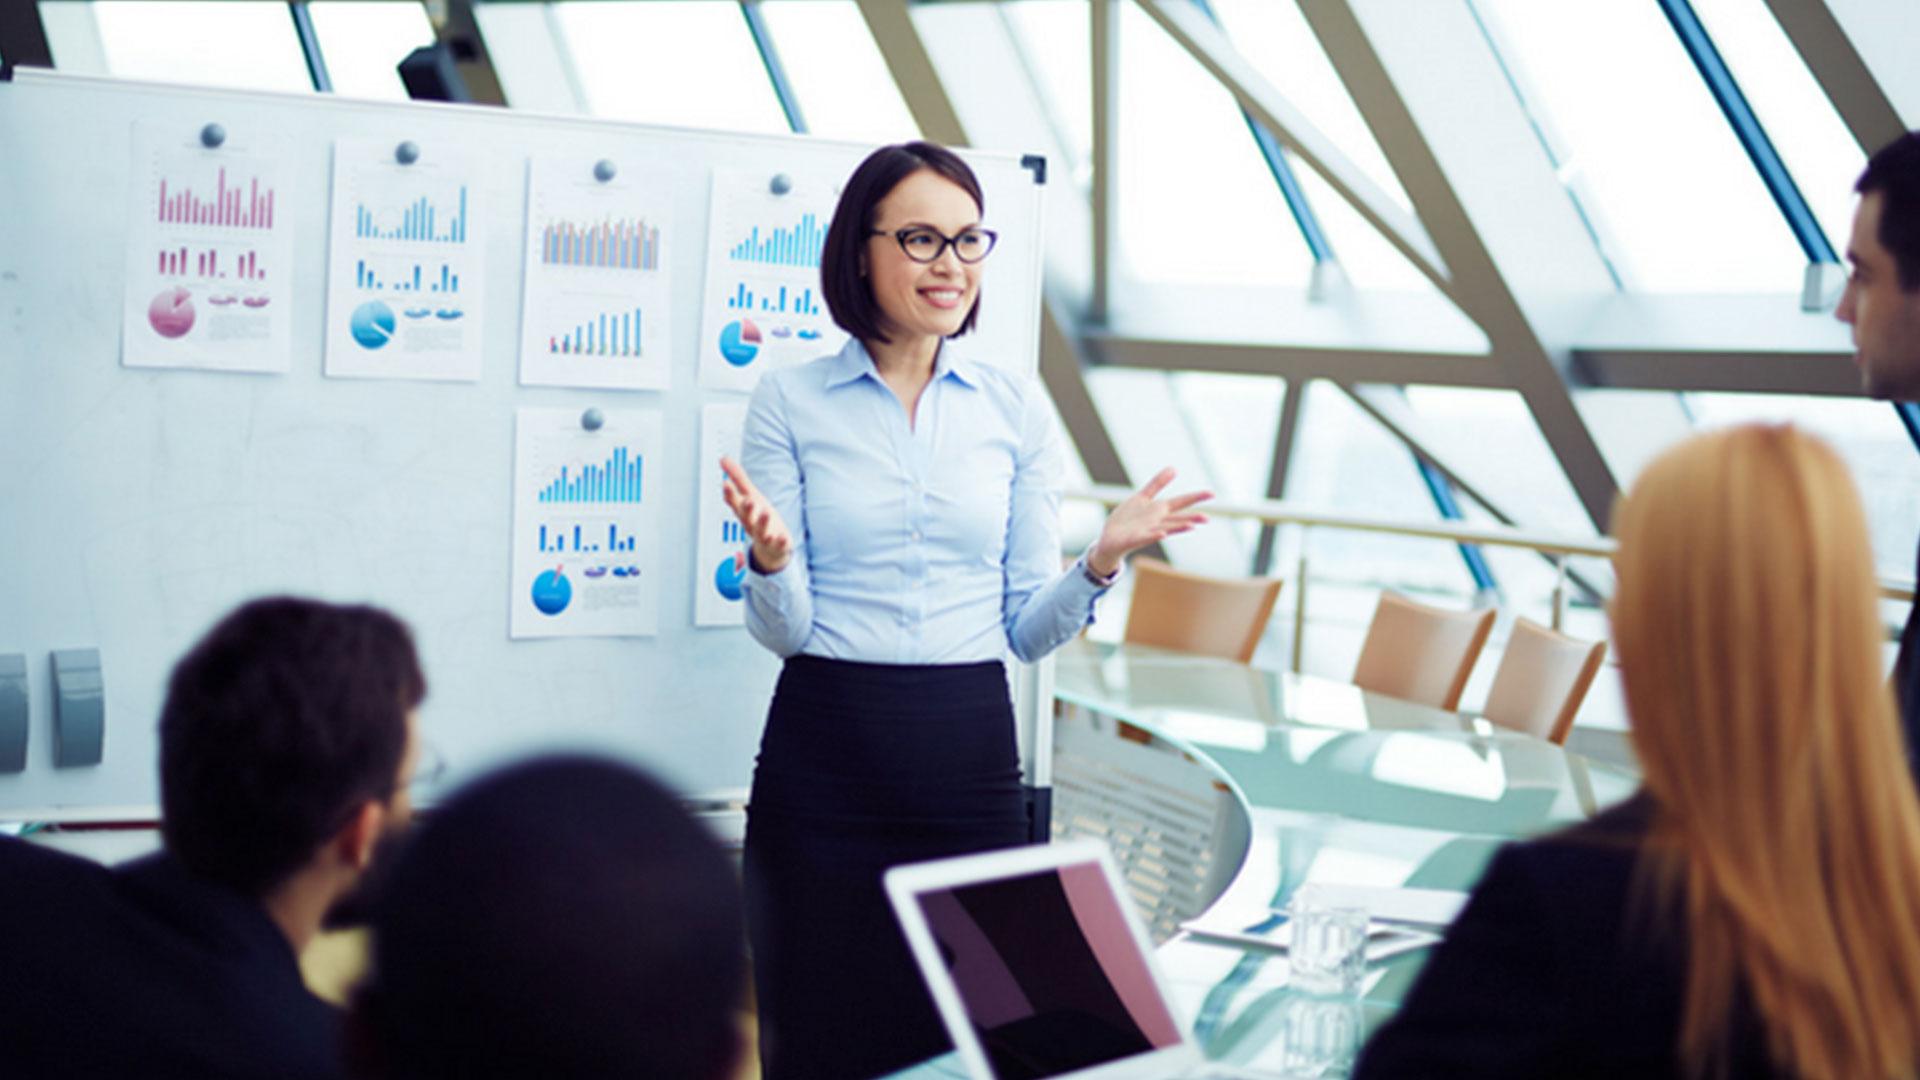 Digital Analytics training